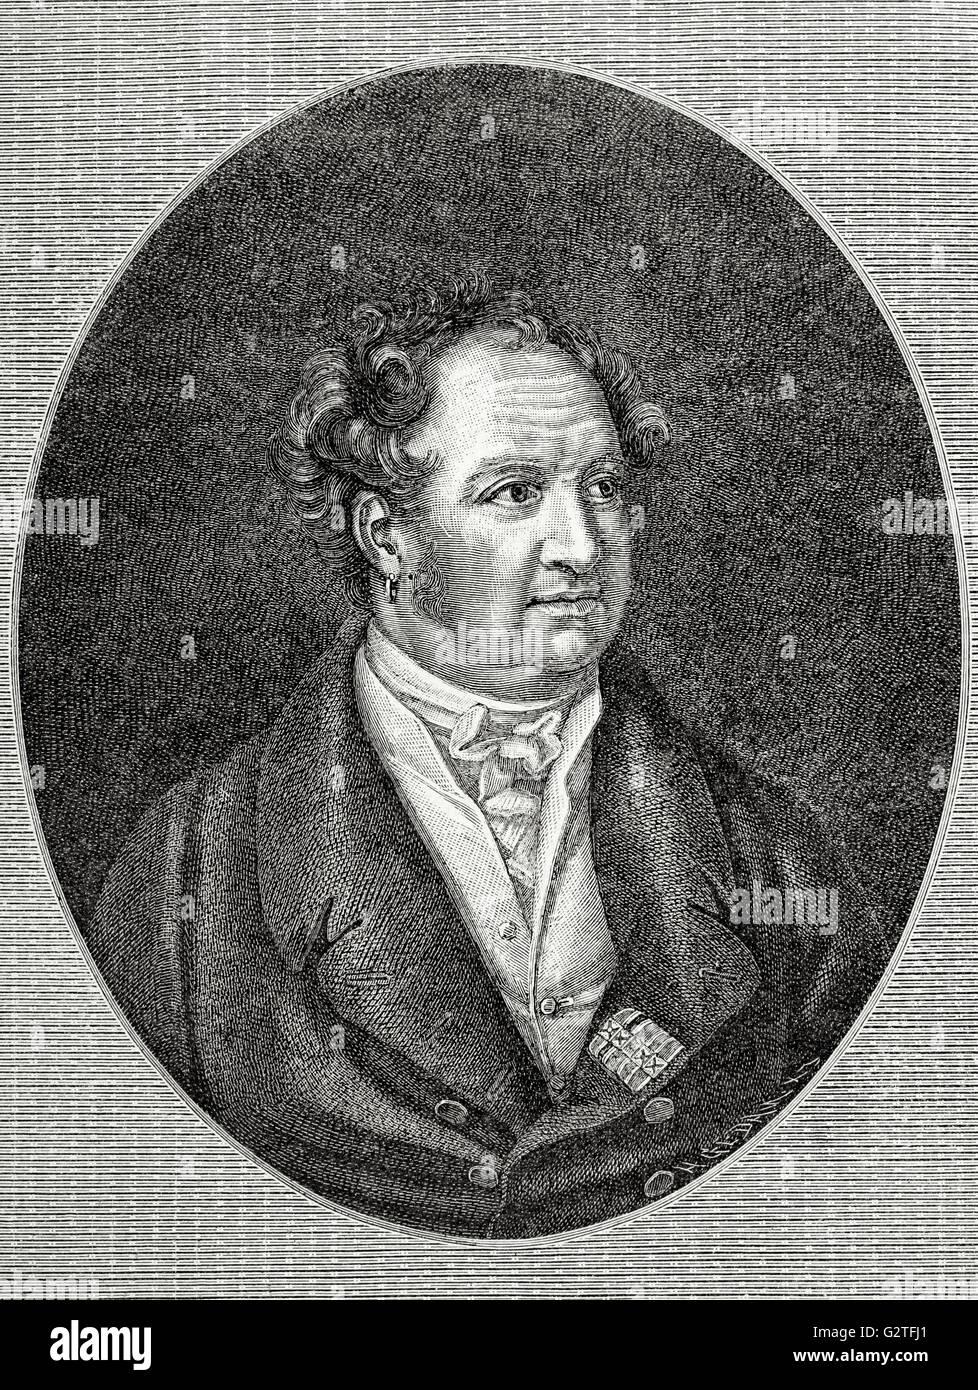 Maximilian I (1756-1825). King of Bavaria. Engraving in Universal History, 1885. - Stock Image